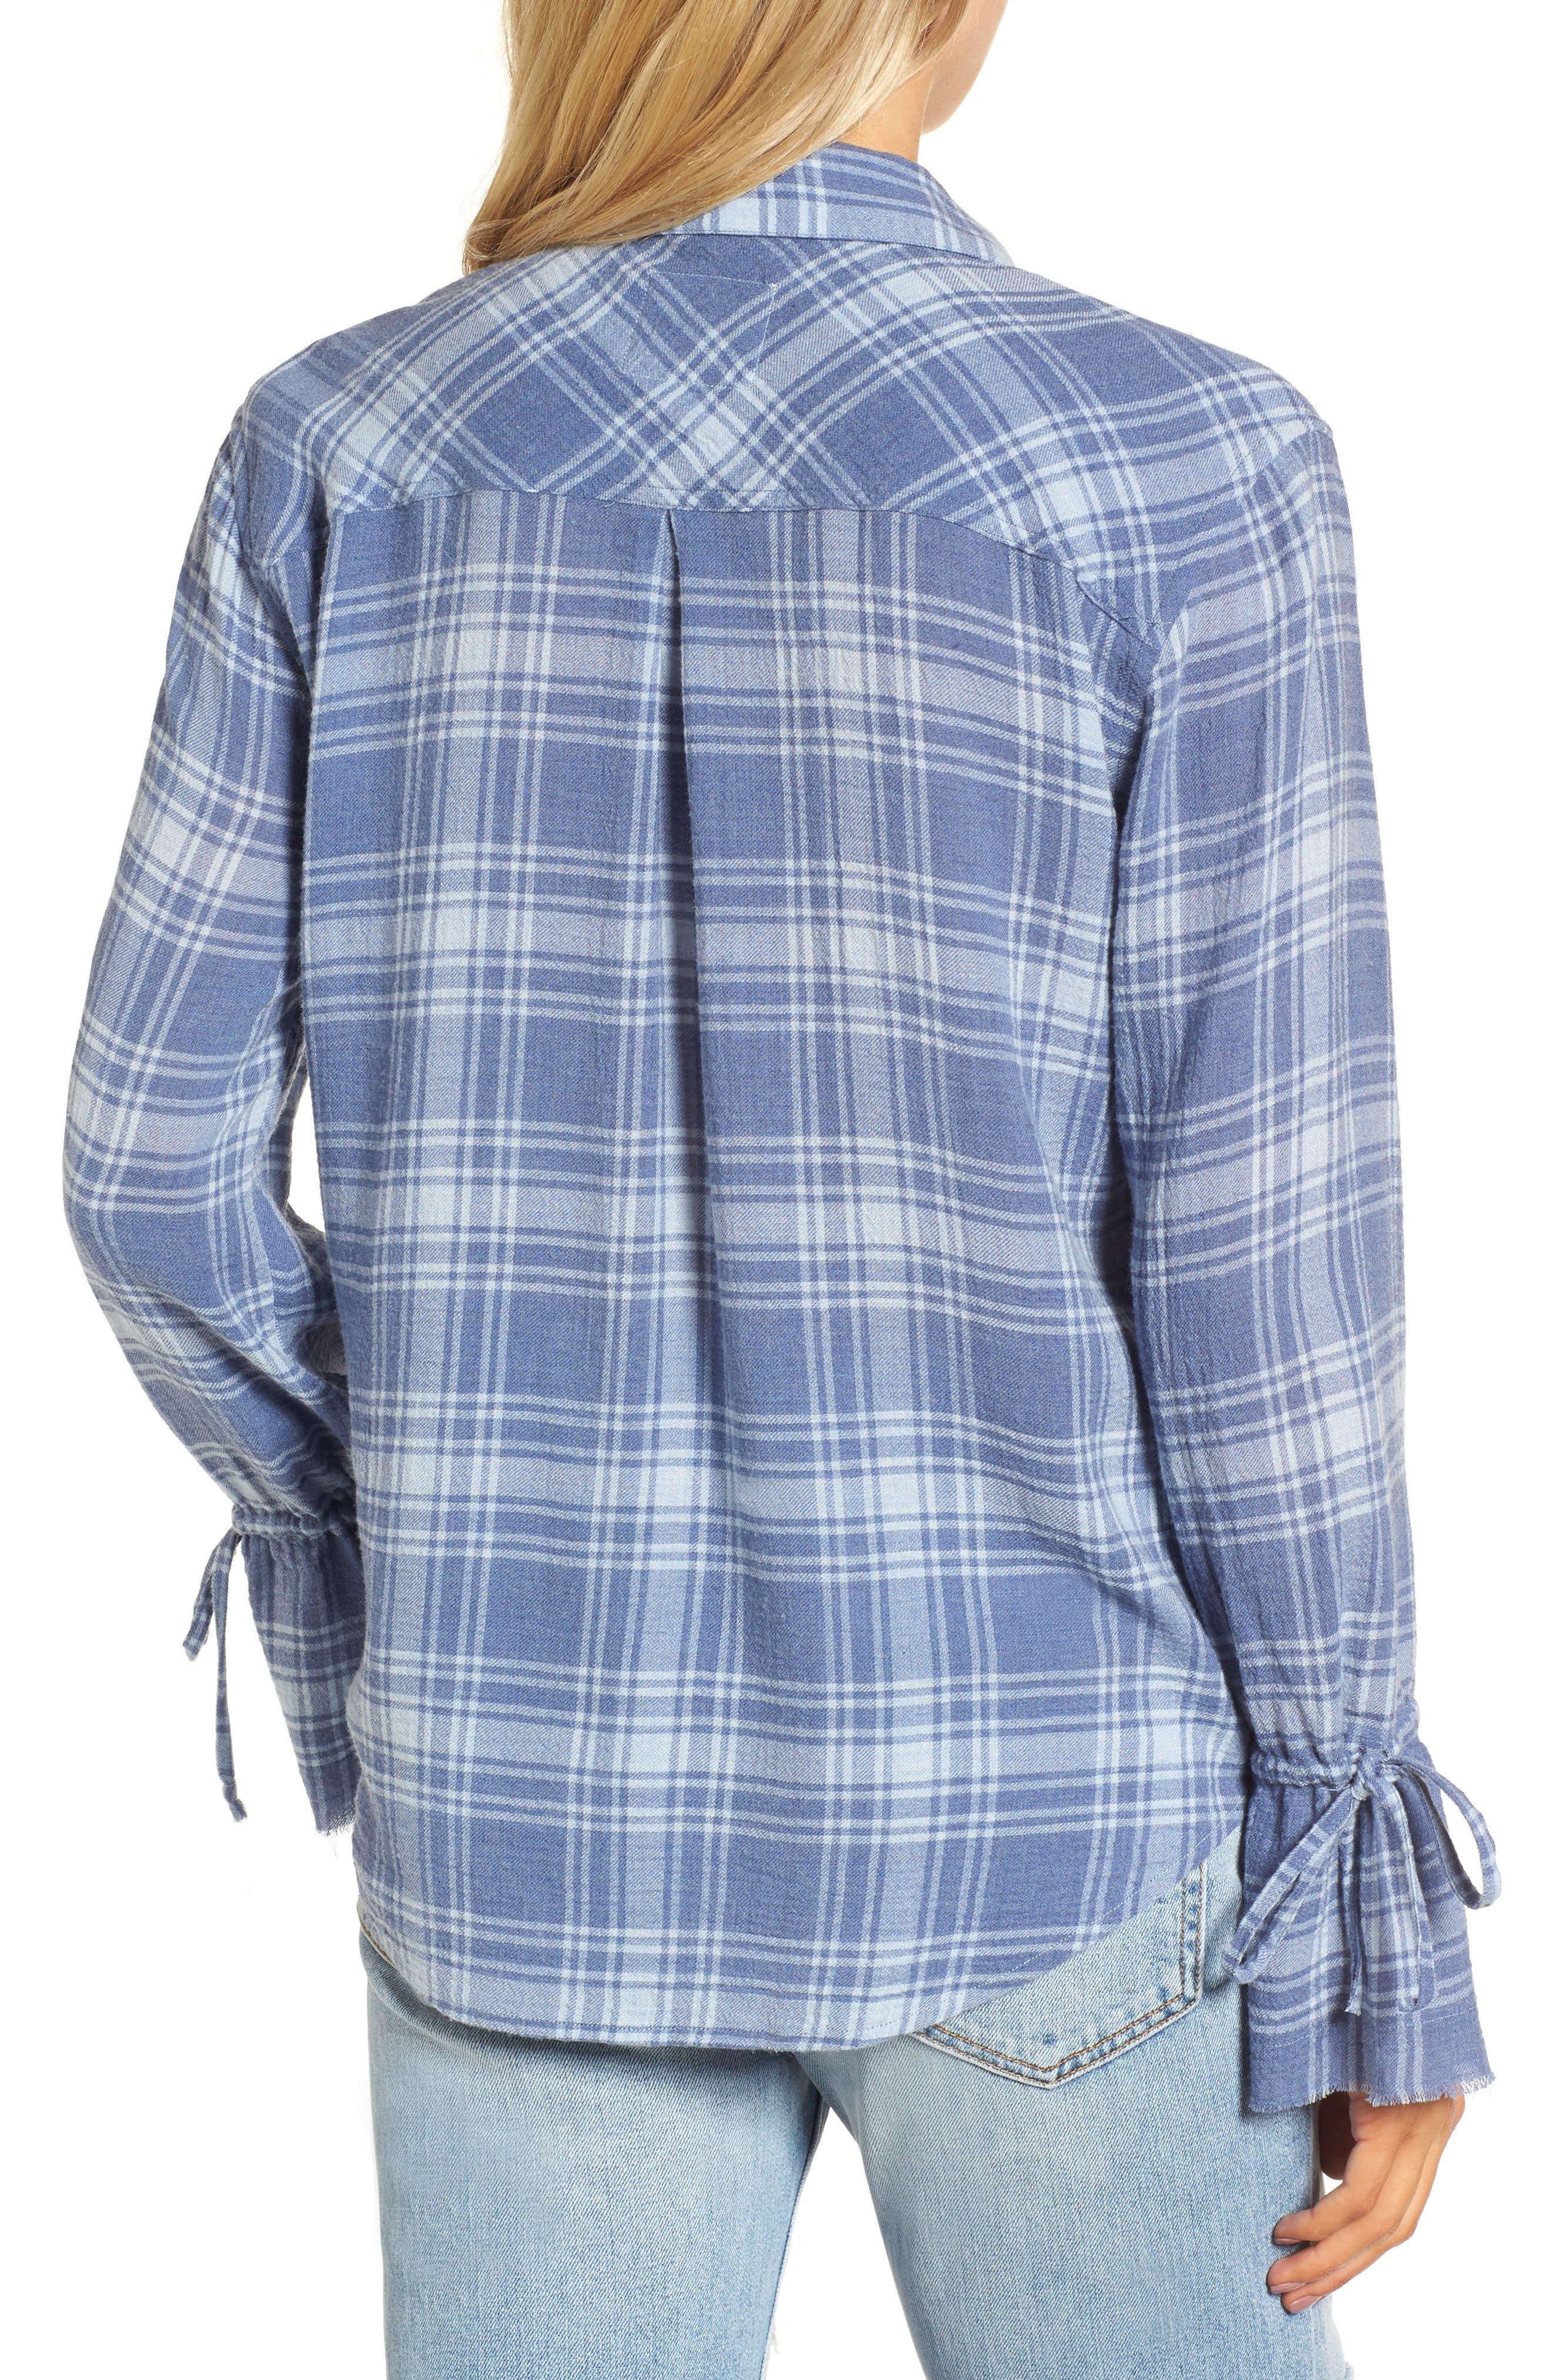 Astrid Tie Cuff Shirt,                             Alternate thumbnail 2, color,                             464